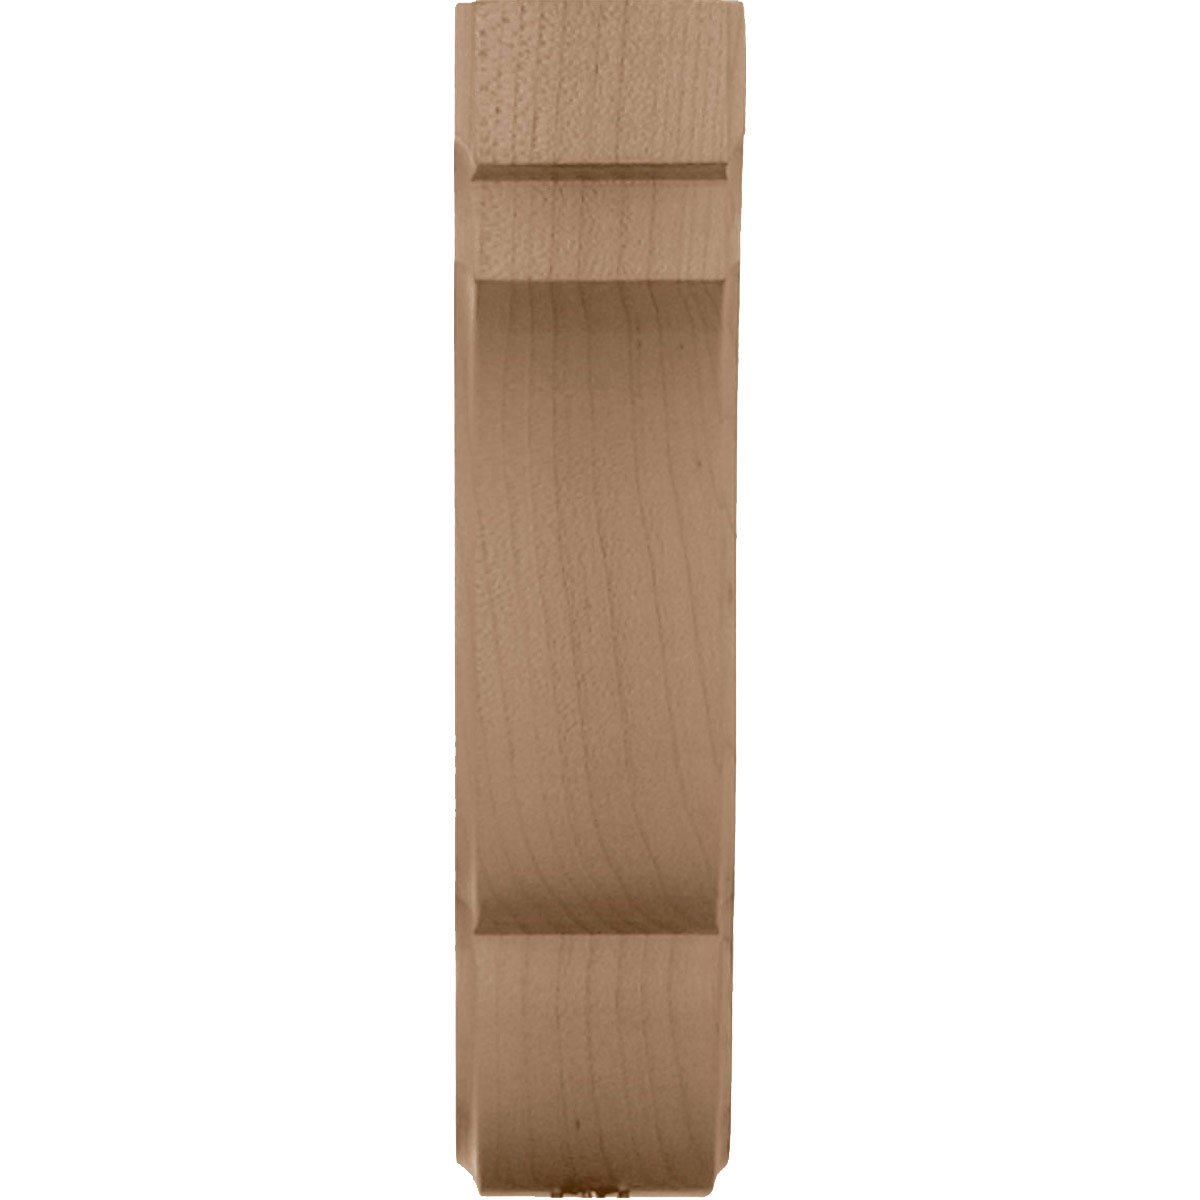 Ekena Millwork BKTW05X09X11BEWA  5 1//4-Inch W by 8 1//2-Inch D by 11-Inch H Bedford Bracket Walnut